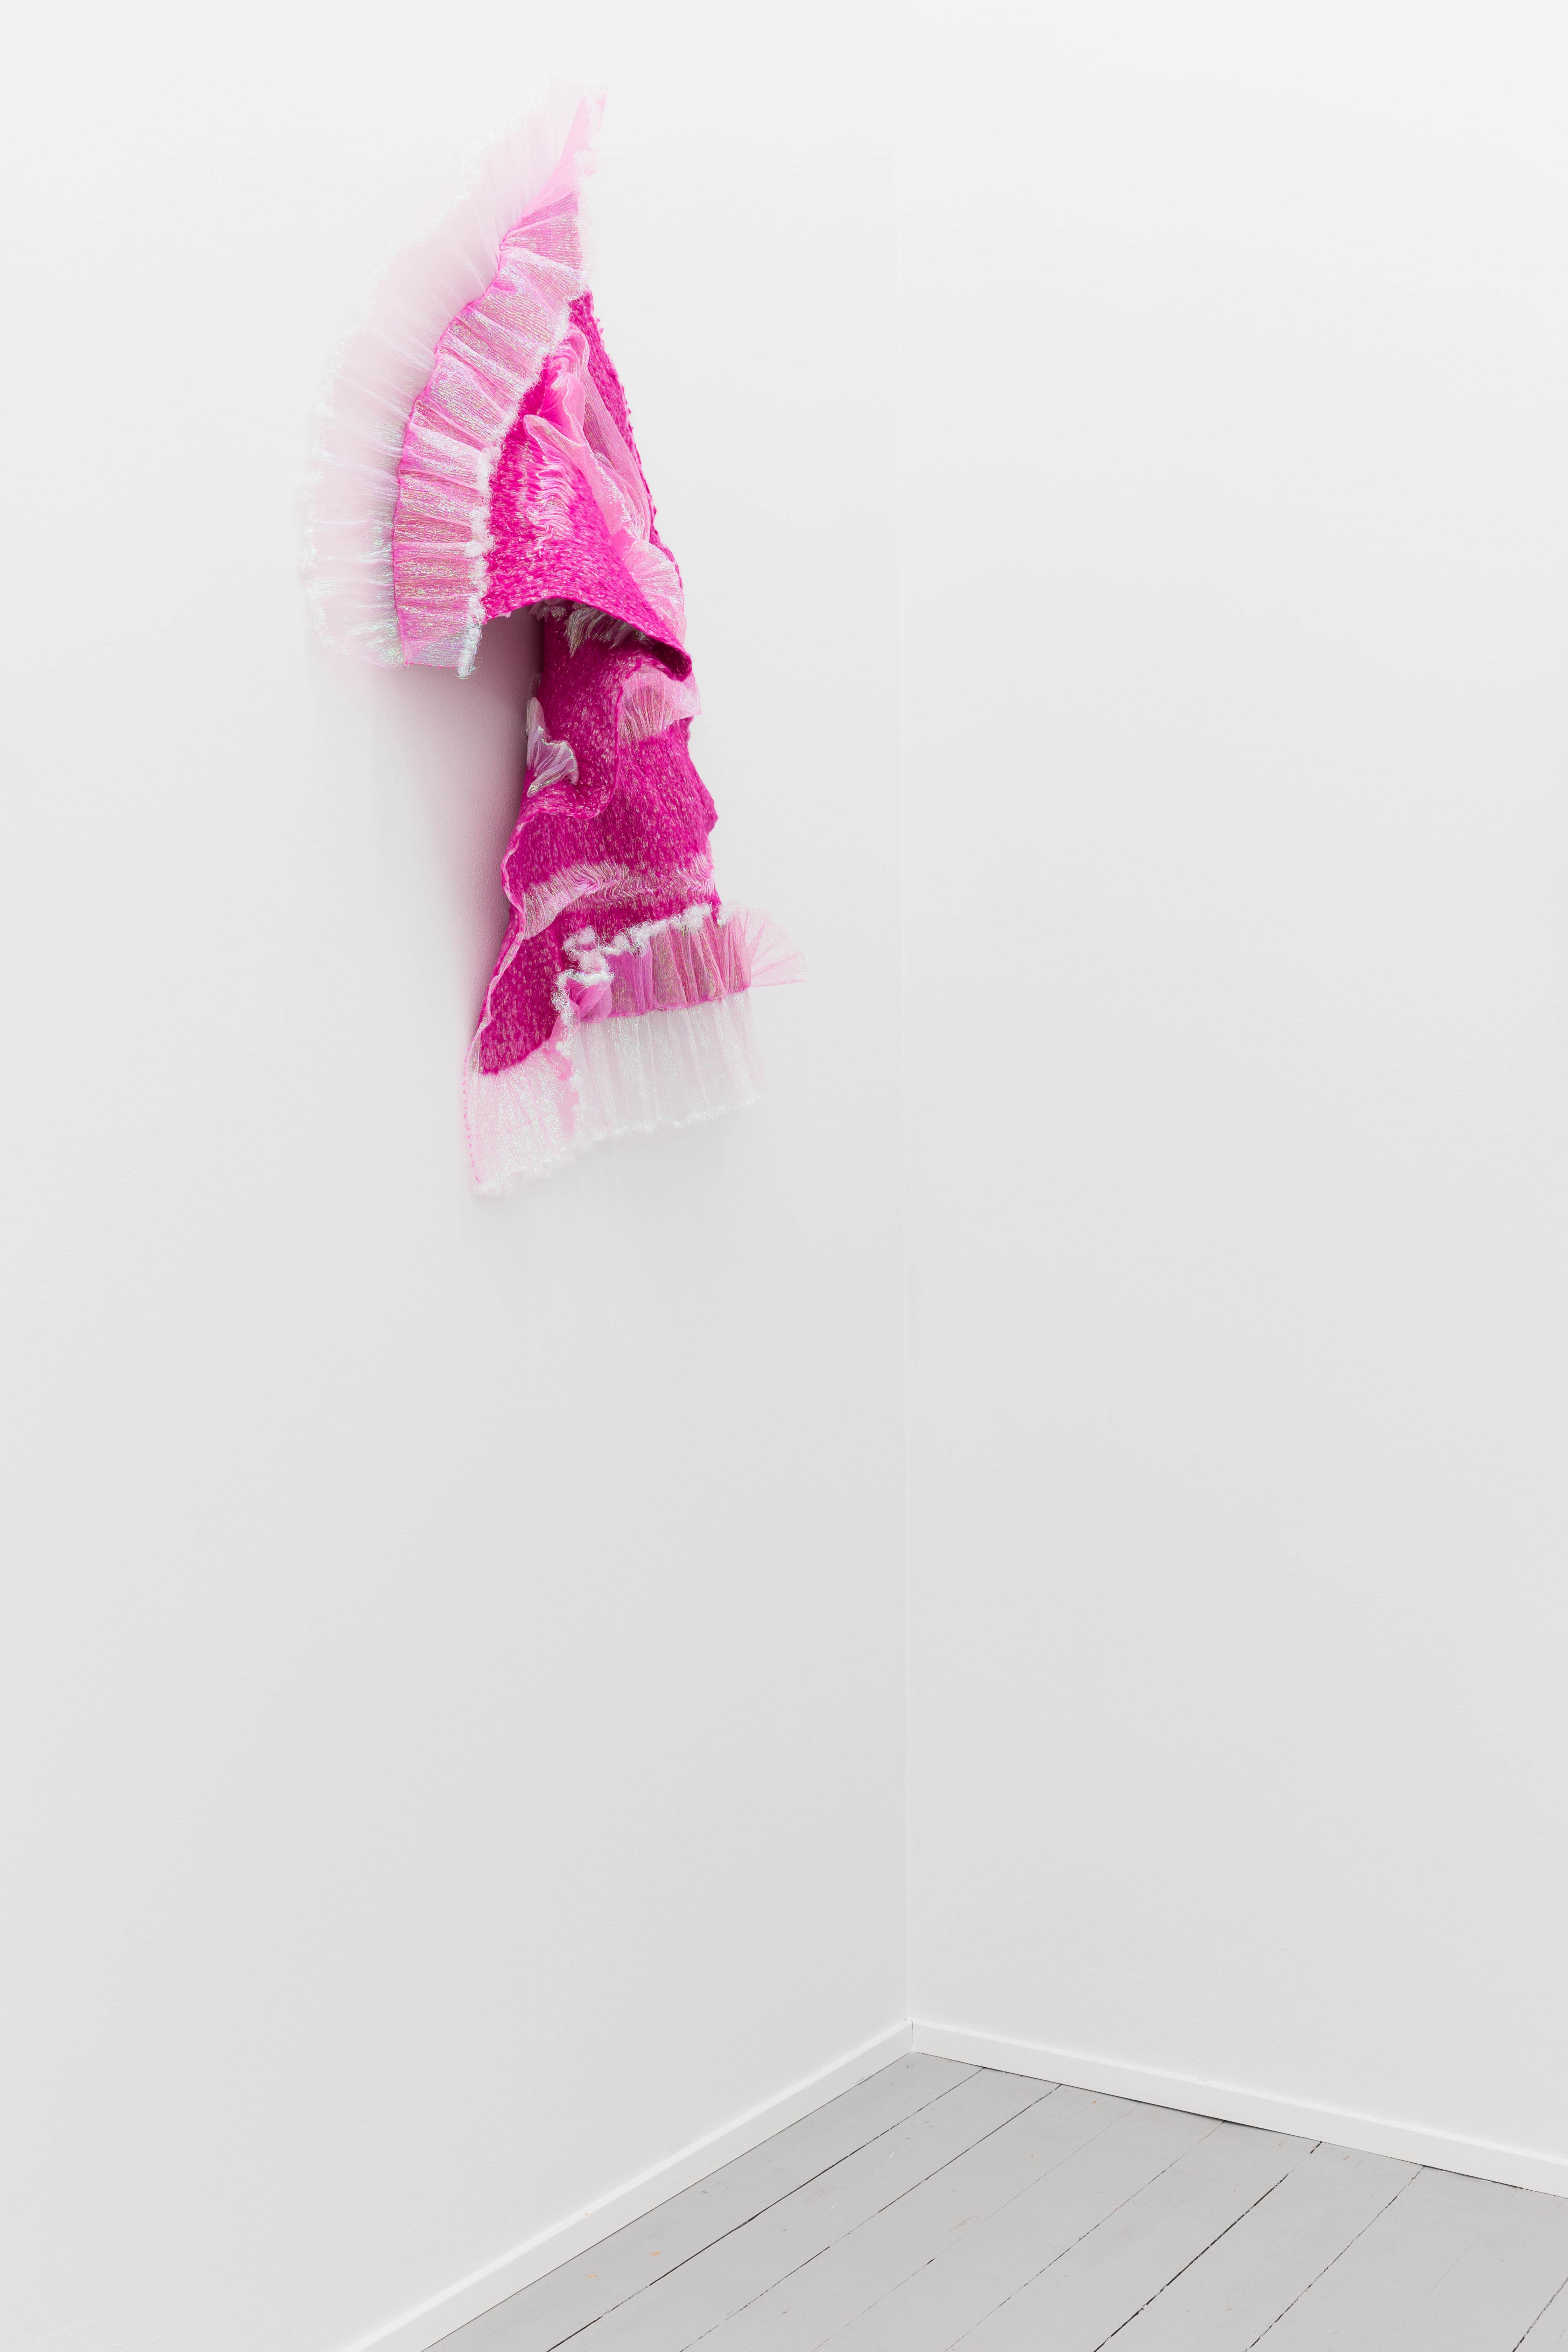 Rookie's Rave #8, 2018, Merino wool, polyester organza, 100 x 80 x 20 cm